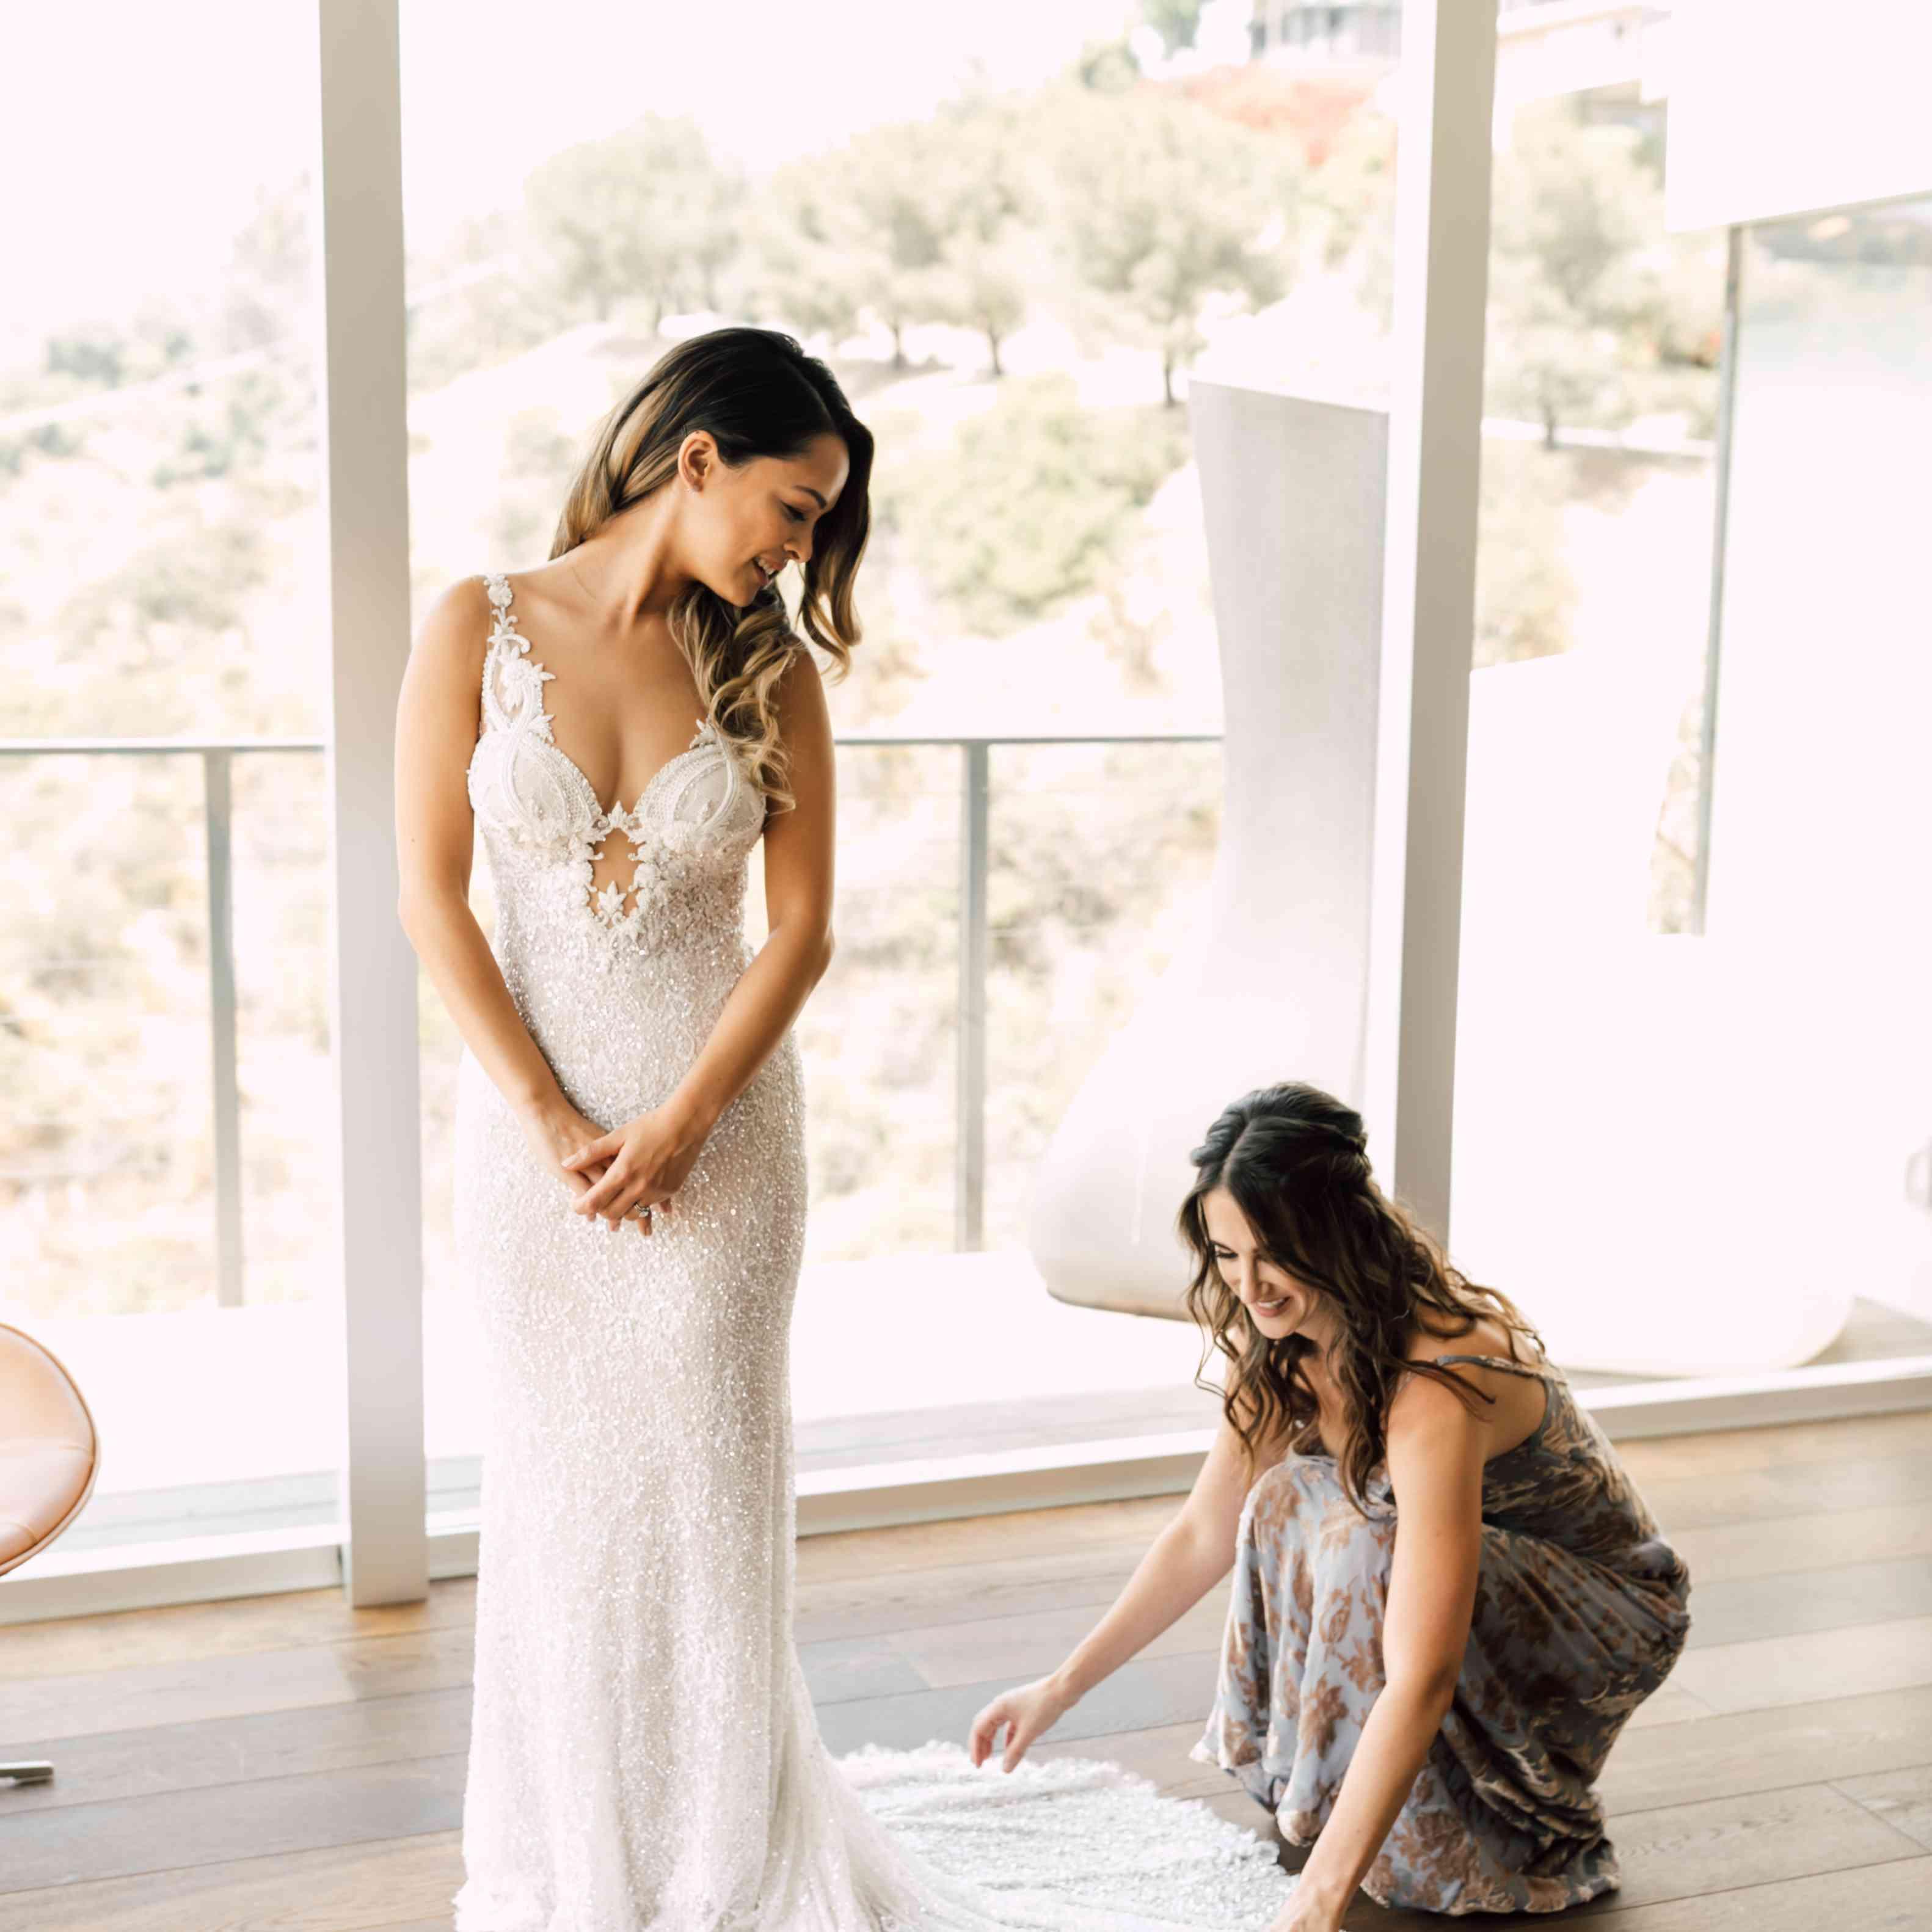 bride's friend fixing dress